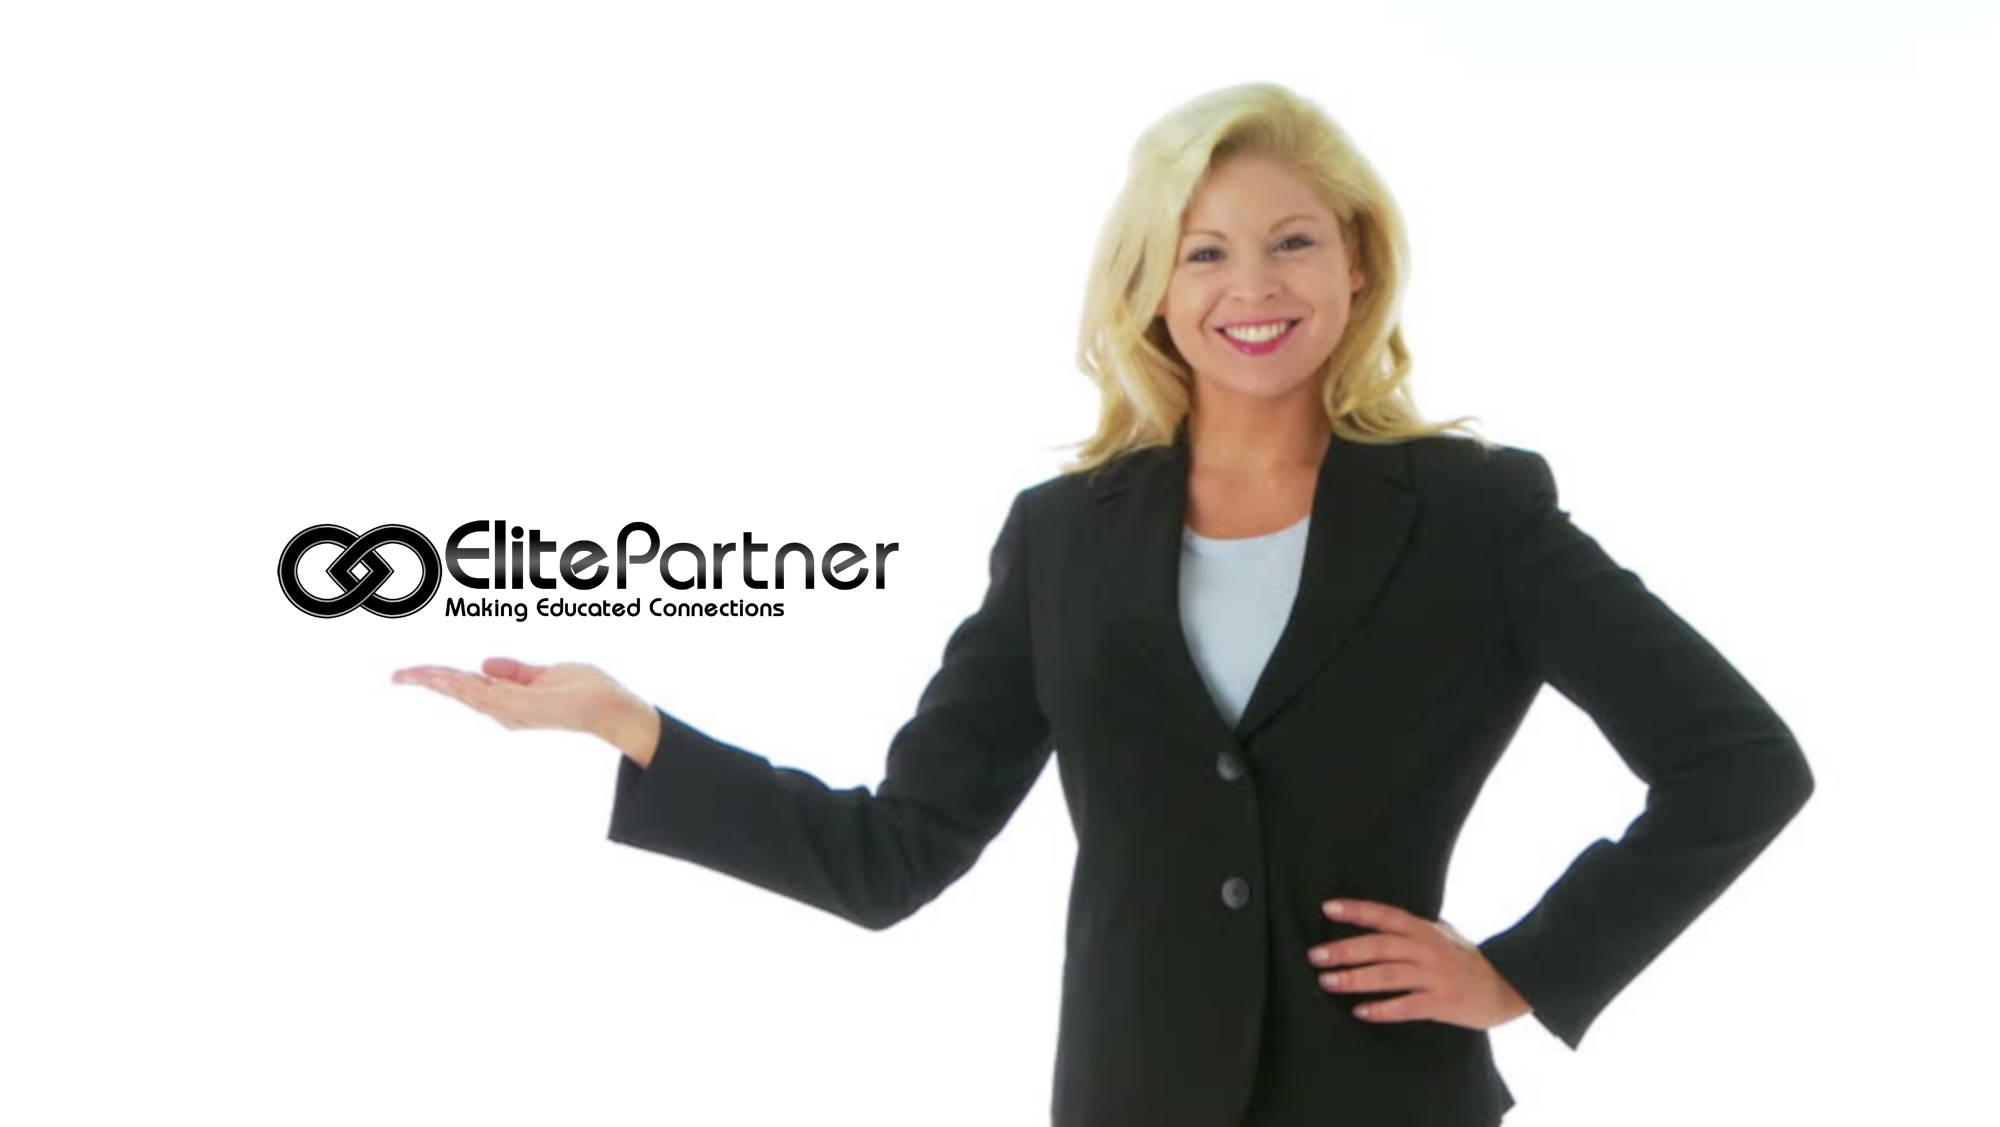 Elitepartner Hotline